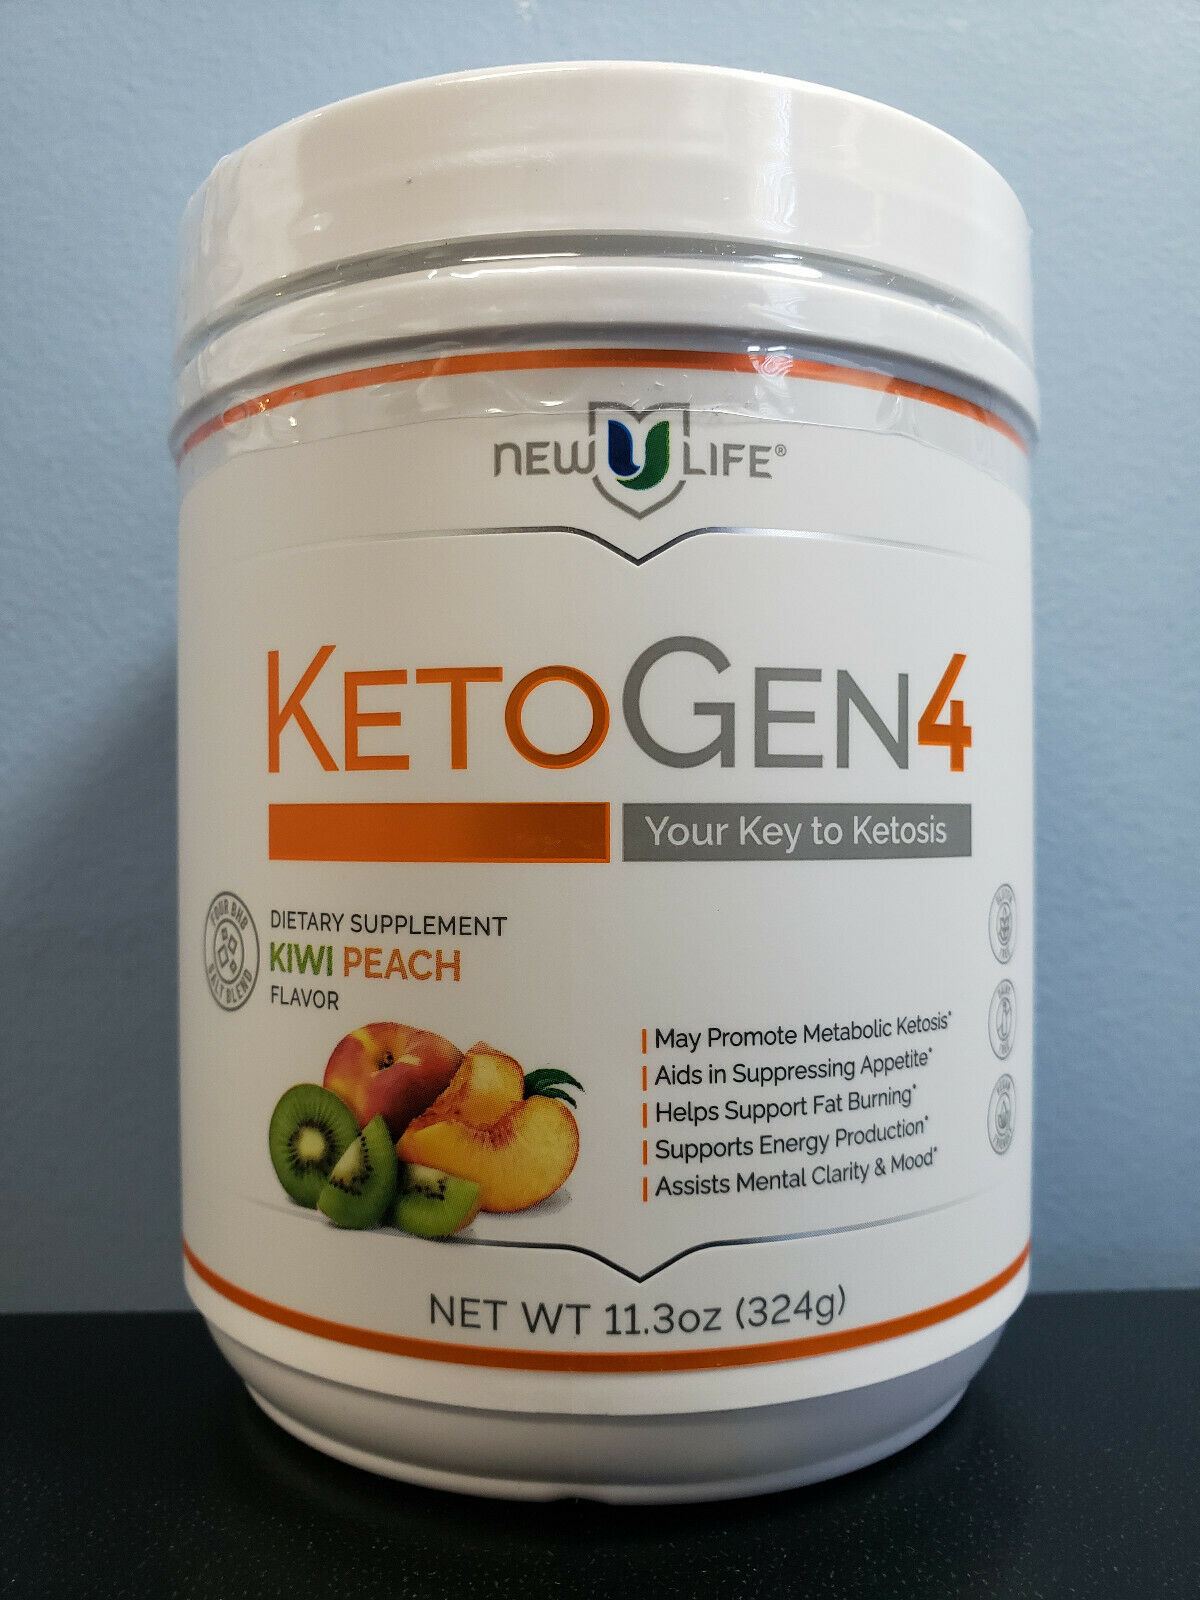 New U Life KetoGen4 Kiwi Peach 11.3 oz - New / Sealed! Exp 7/2021! NewULife